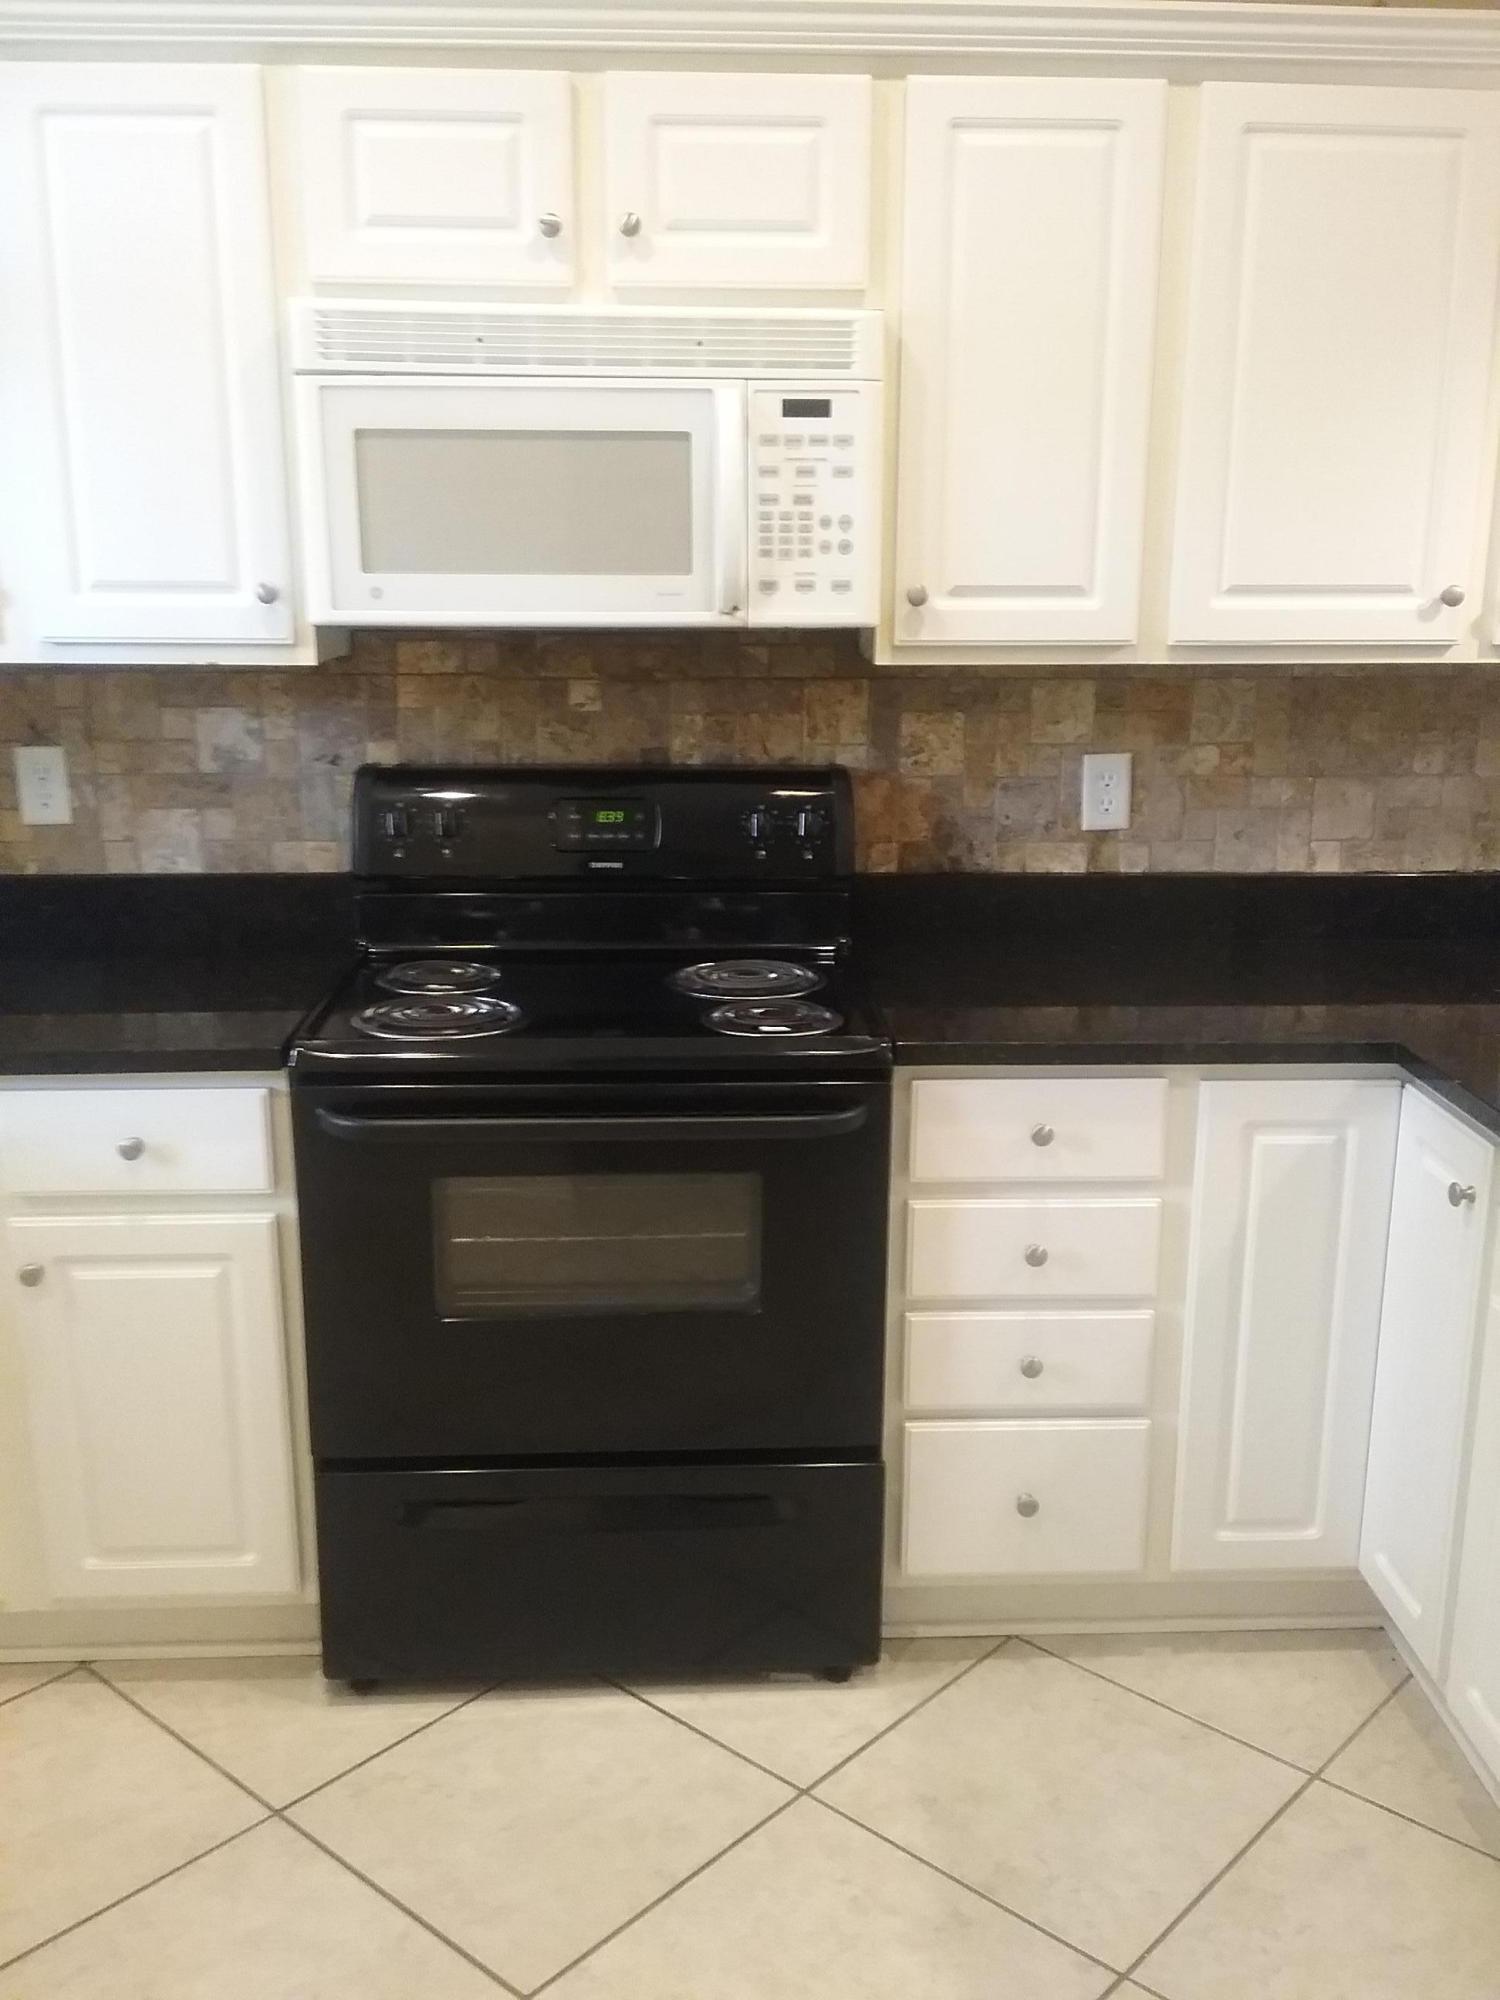 Ballards Pointe II Homes For Sale - 103 Ballard, Santee, SC - 3